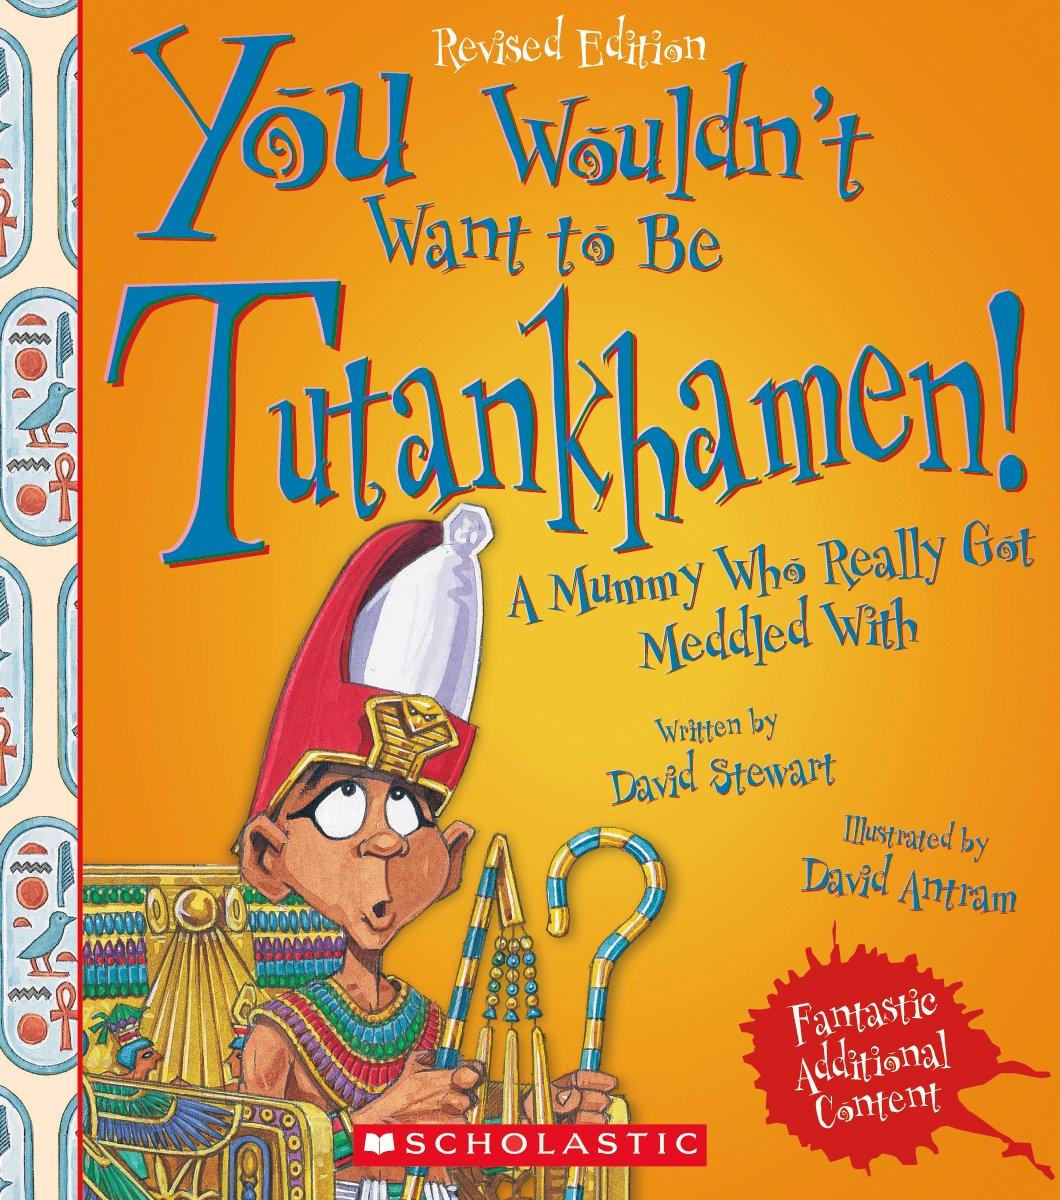 You Wouldn't Want to Be Tutankhamen! Paperback – February 1, 2017 David Stewart David Antram Franklin Watts 0531231593